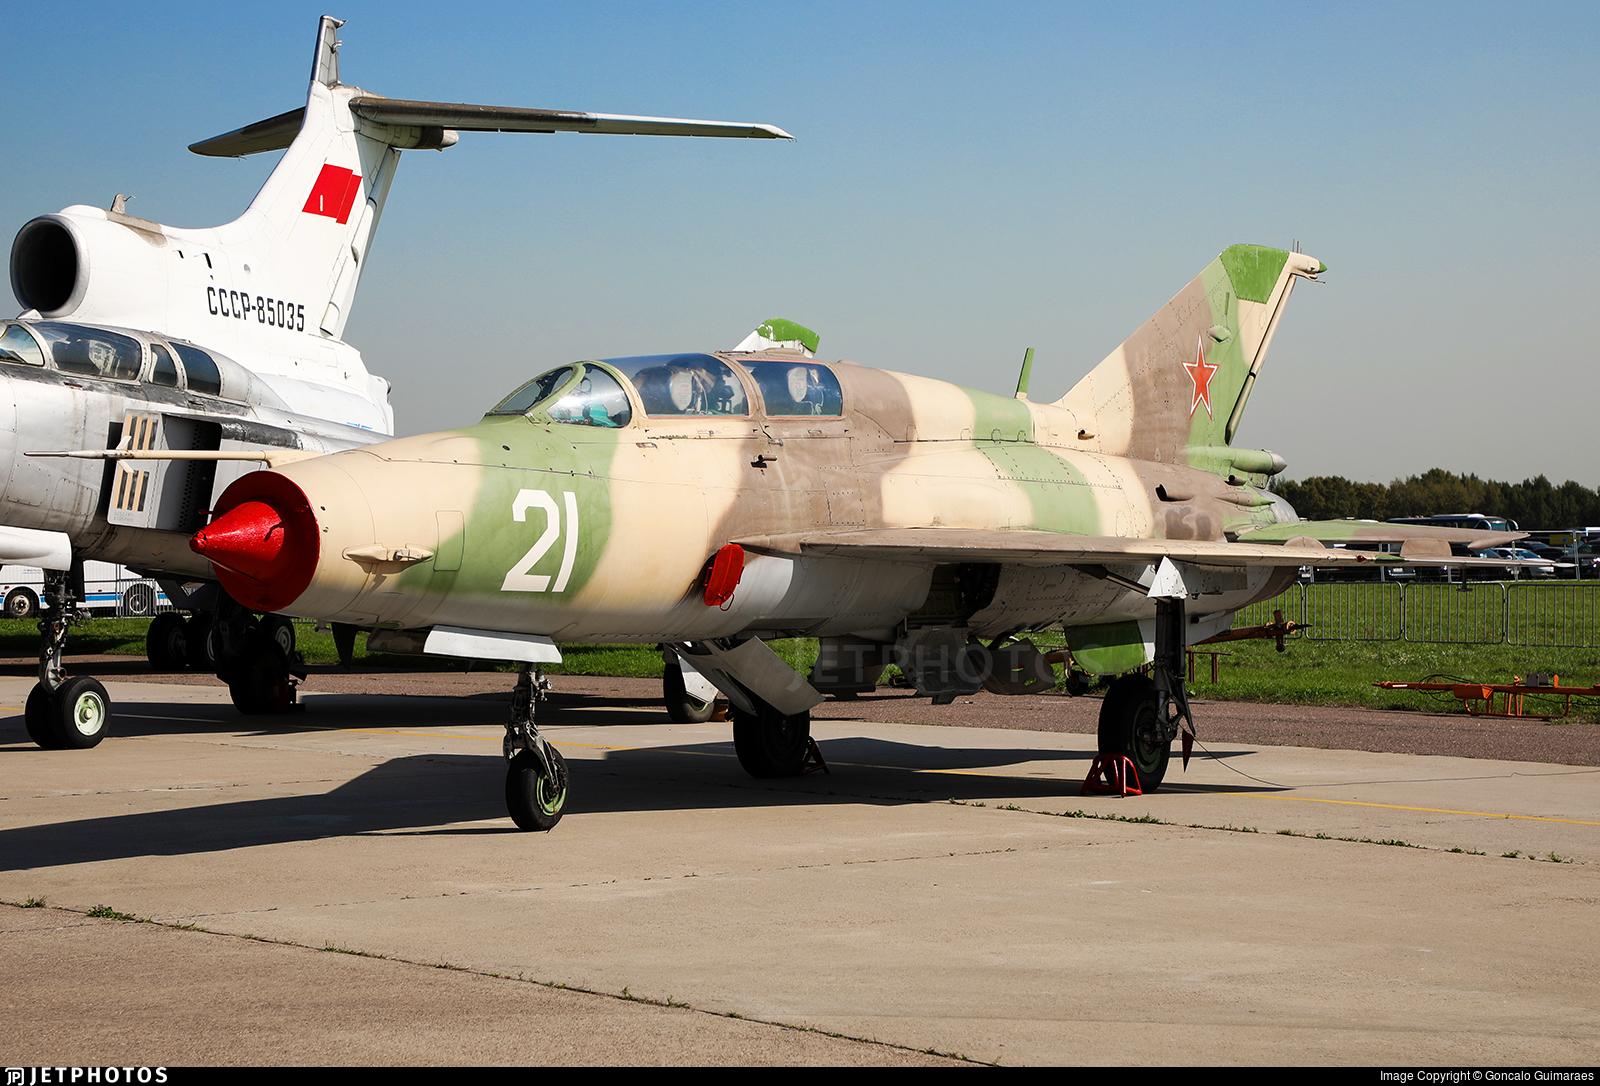 21 - Mikoyan-Gurevich MiG-21UM Mongol B - Soviet Union - Air Force